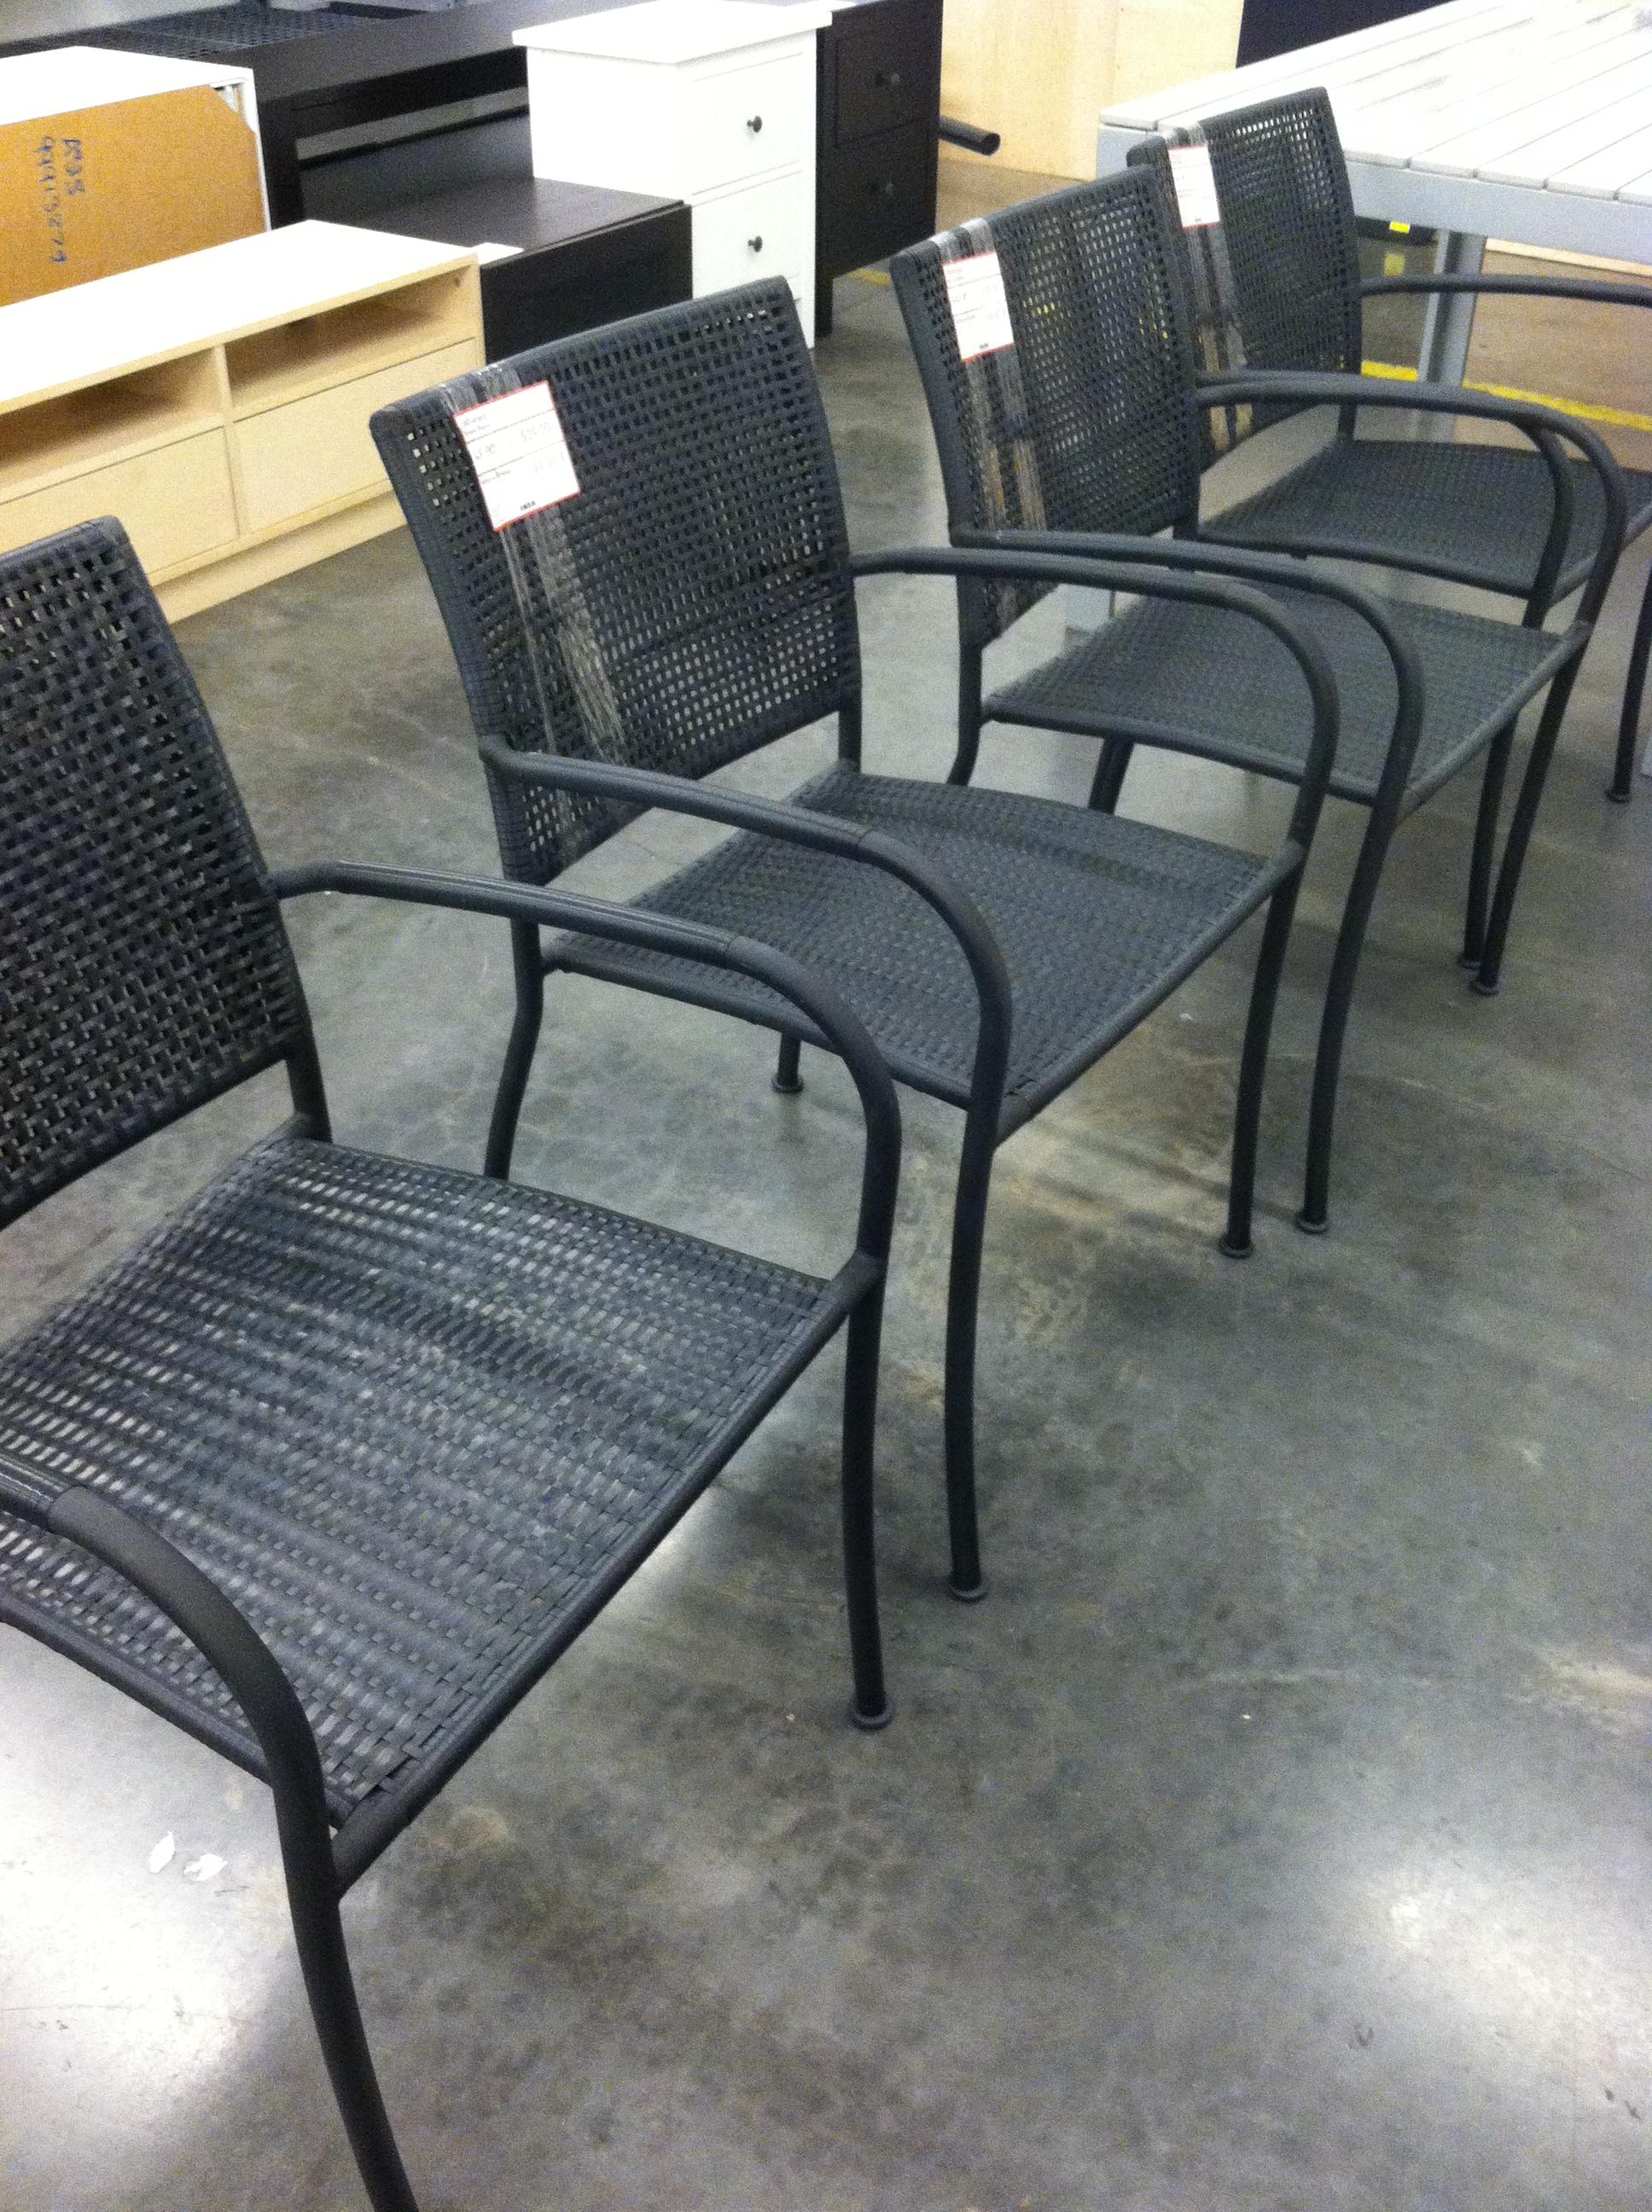 ... Patio Chairs